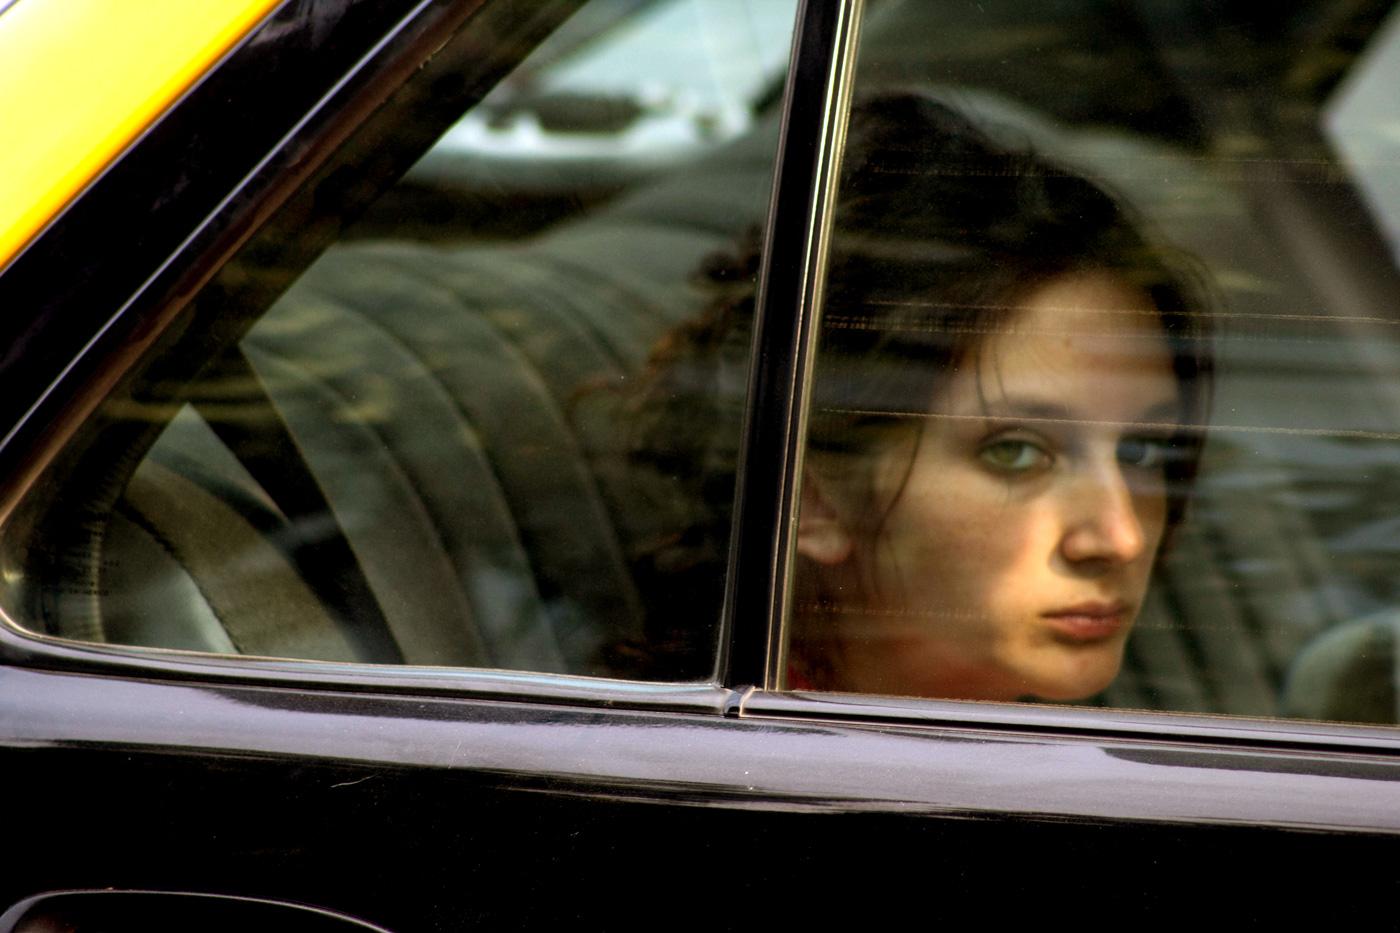 Mujer en taxi. Avenida Bilbao.